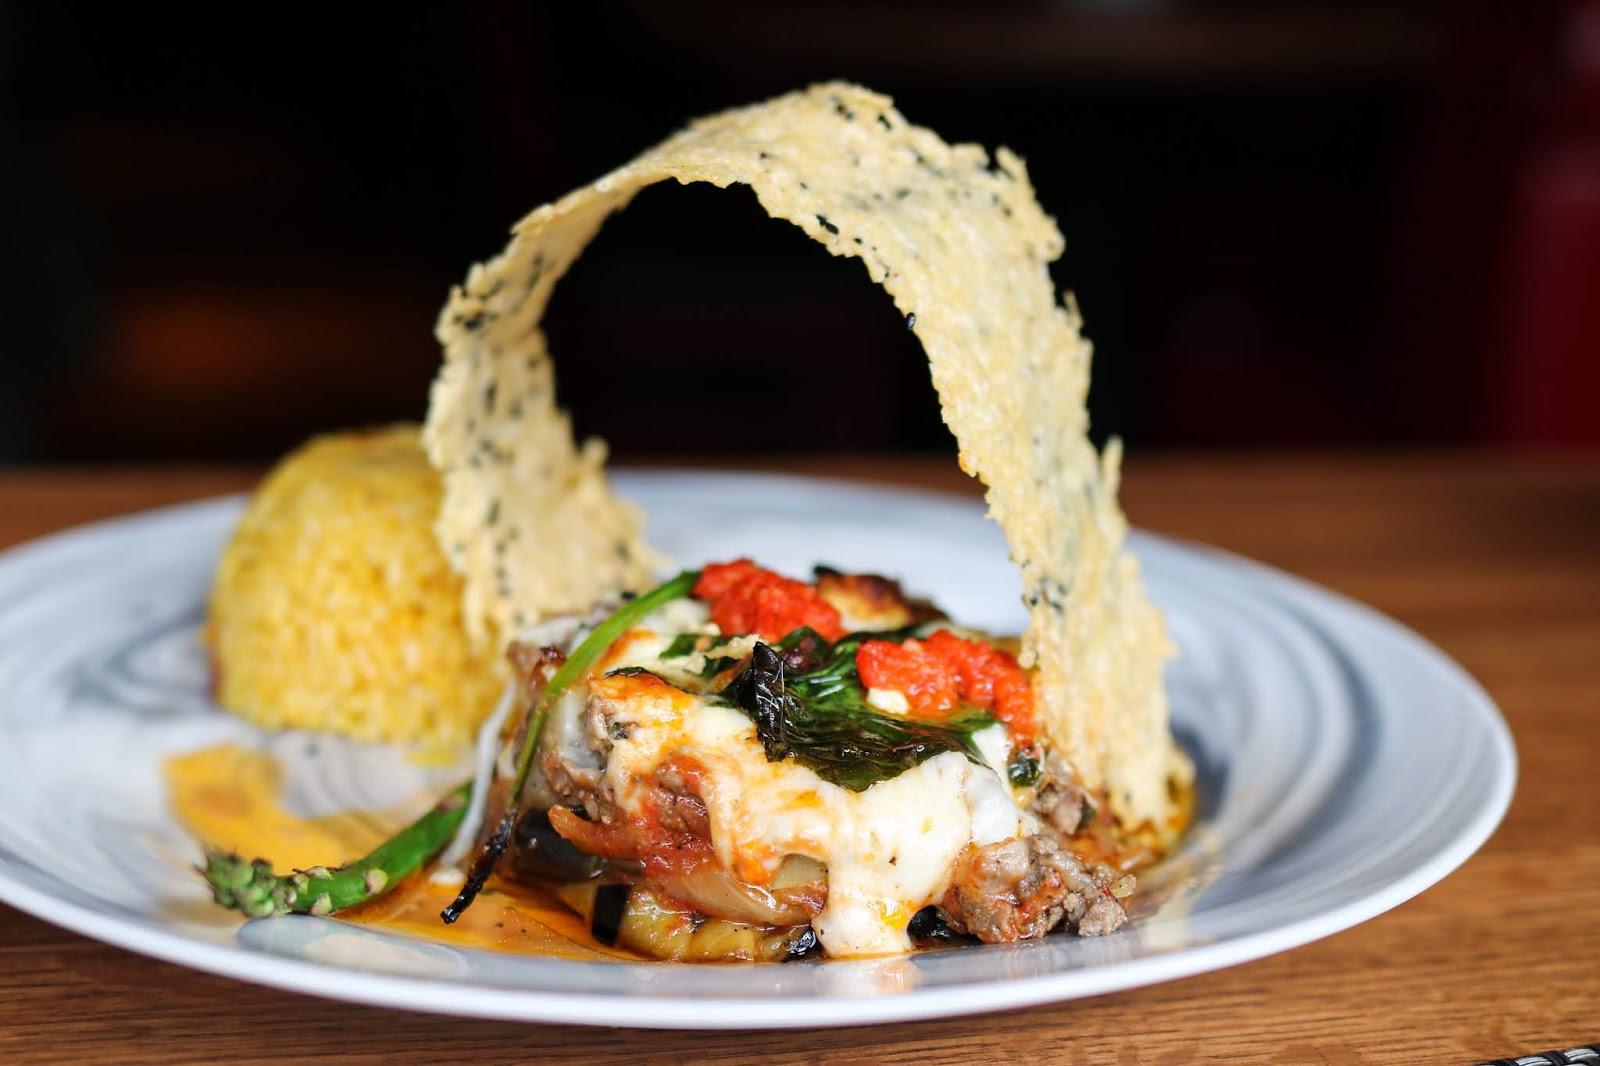 Chicago Eats: Oda Mediterranean Cuisine